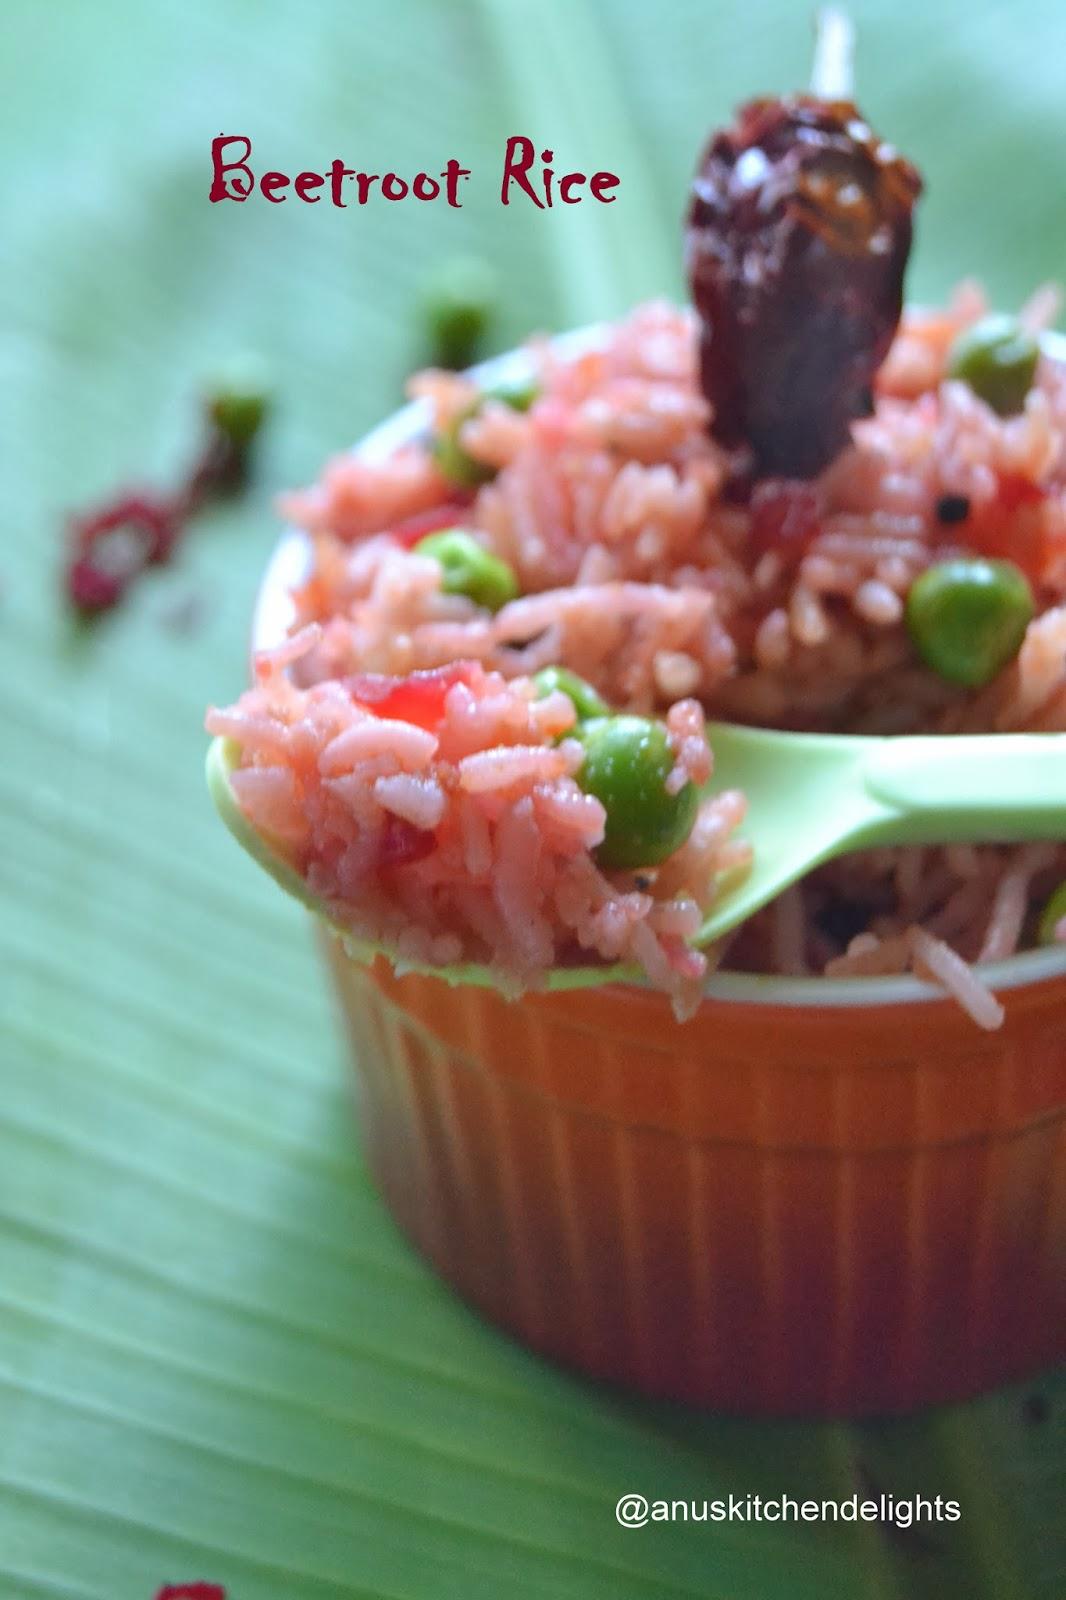 Beeroot Rice